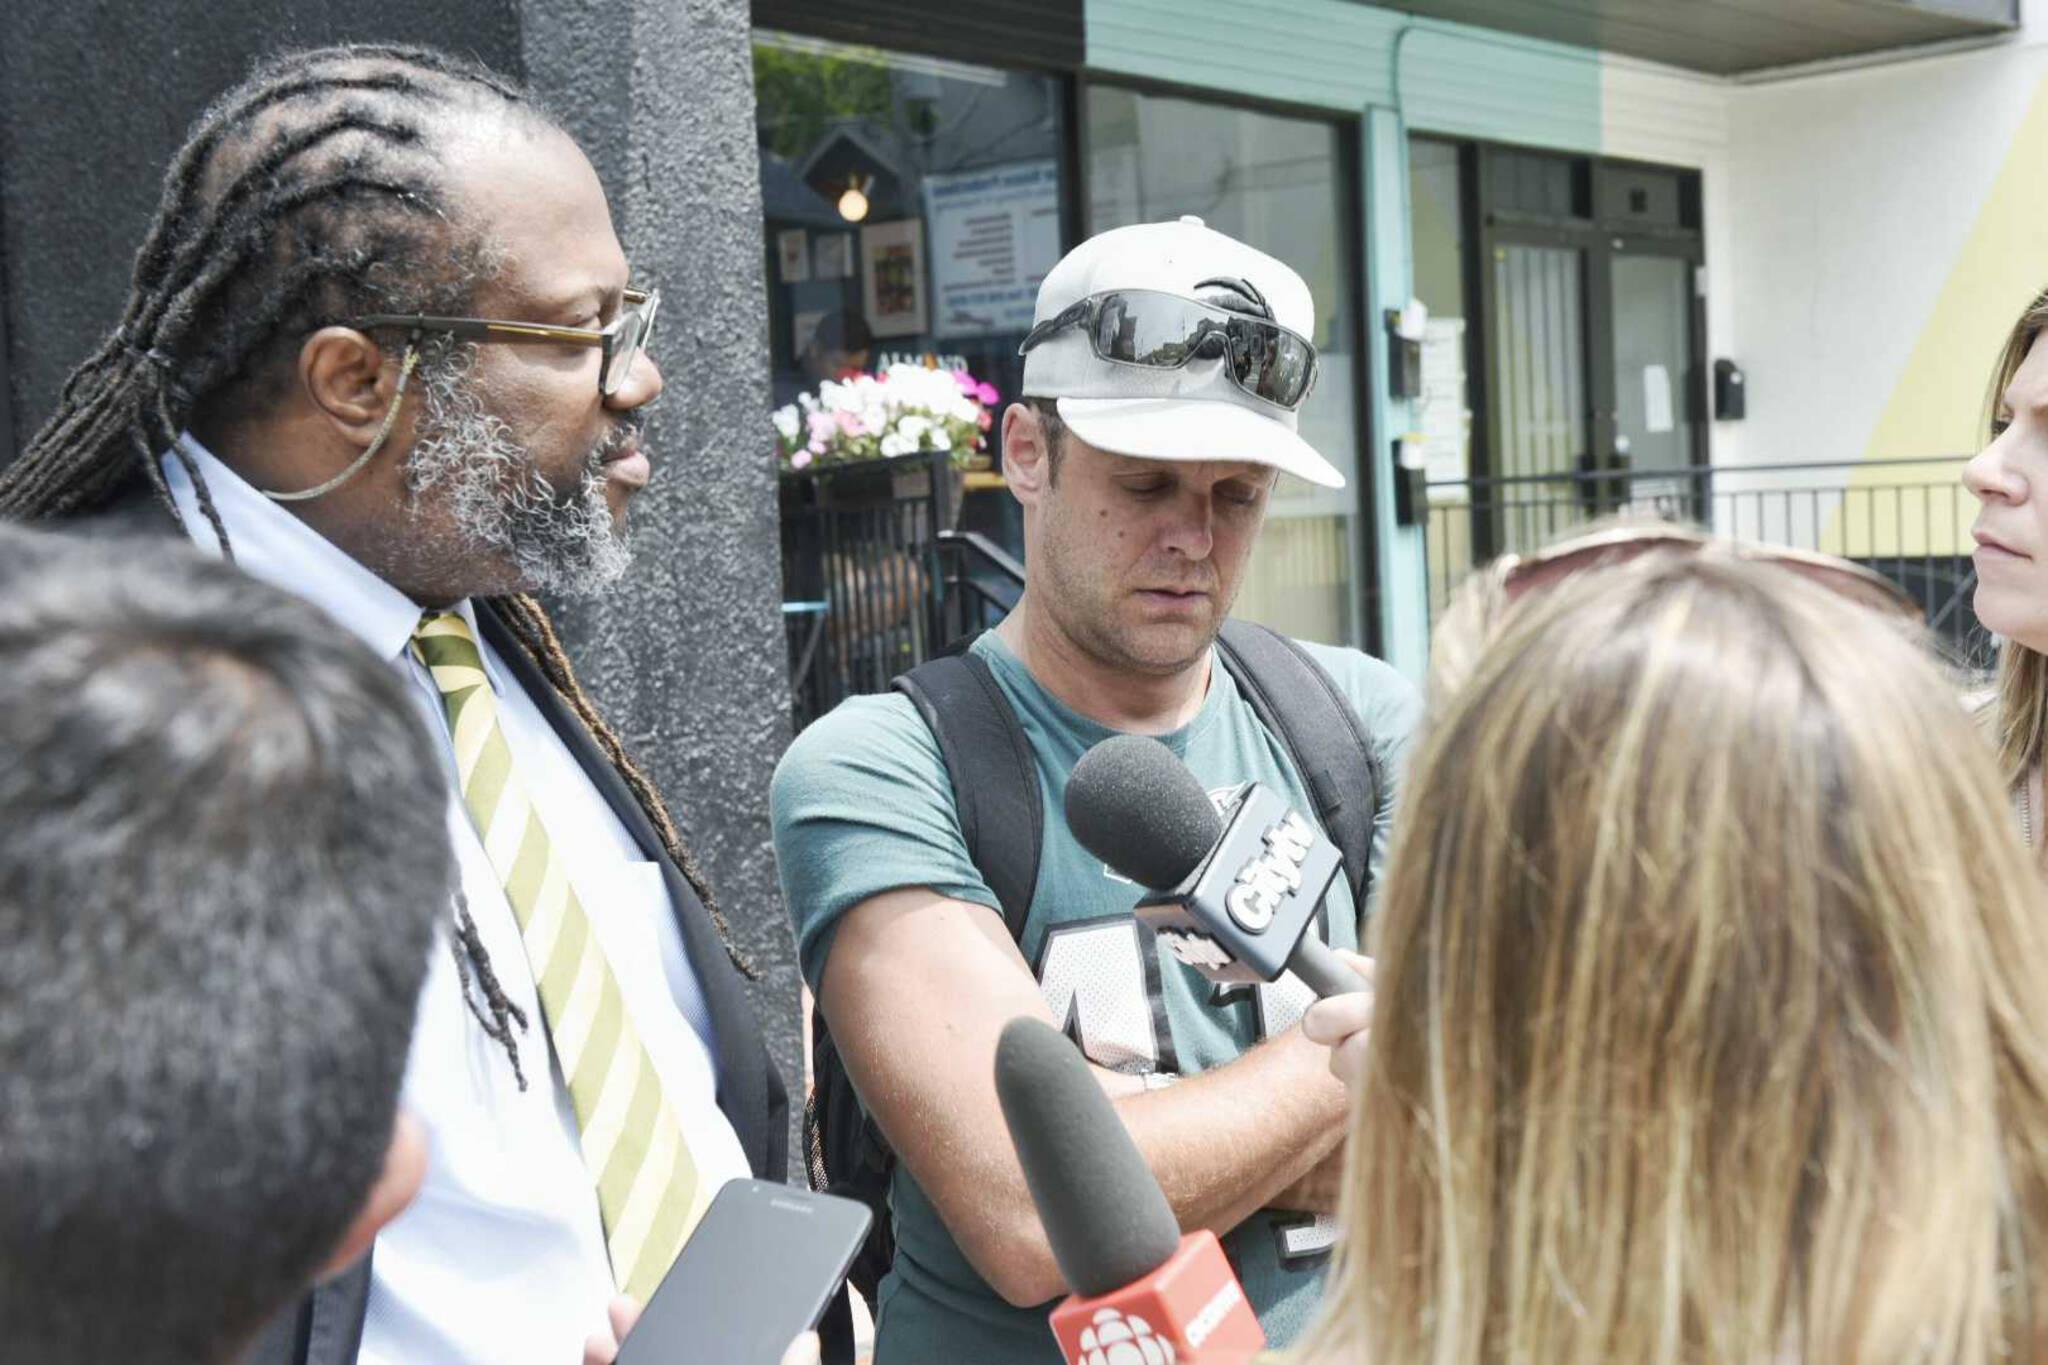 Toronto Police raid popular illegal cannabis store